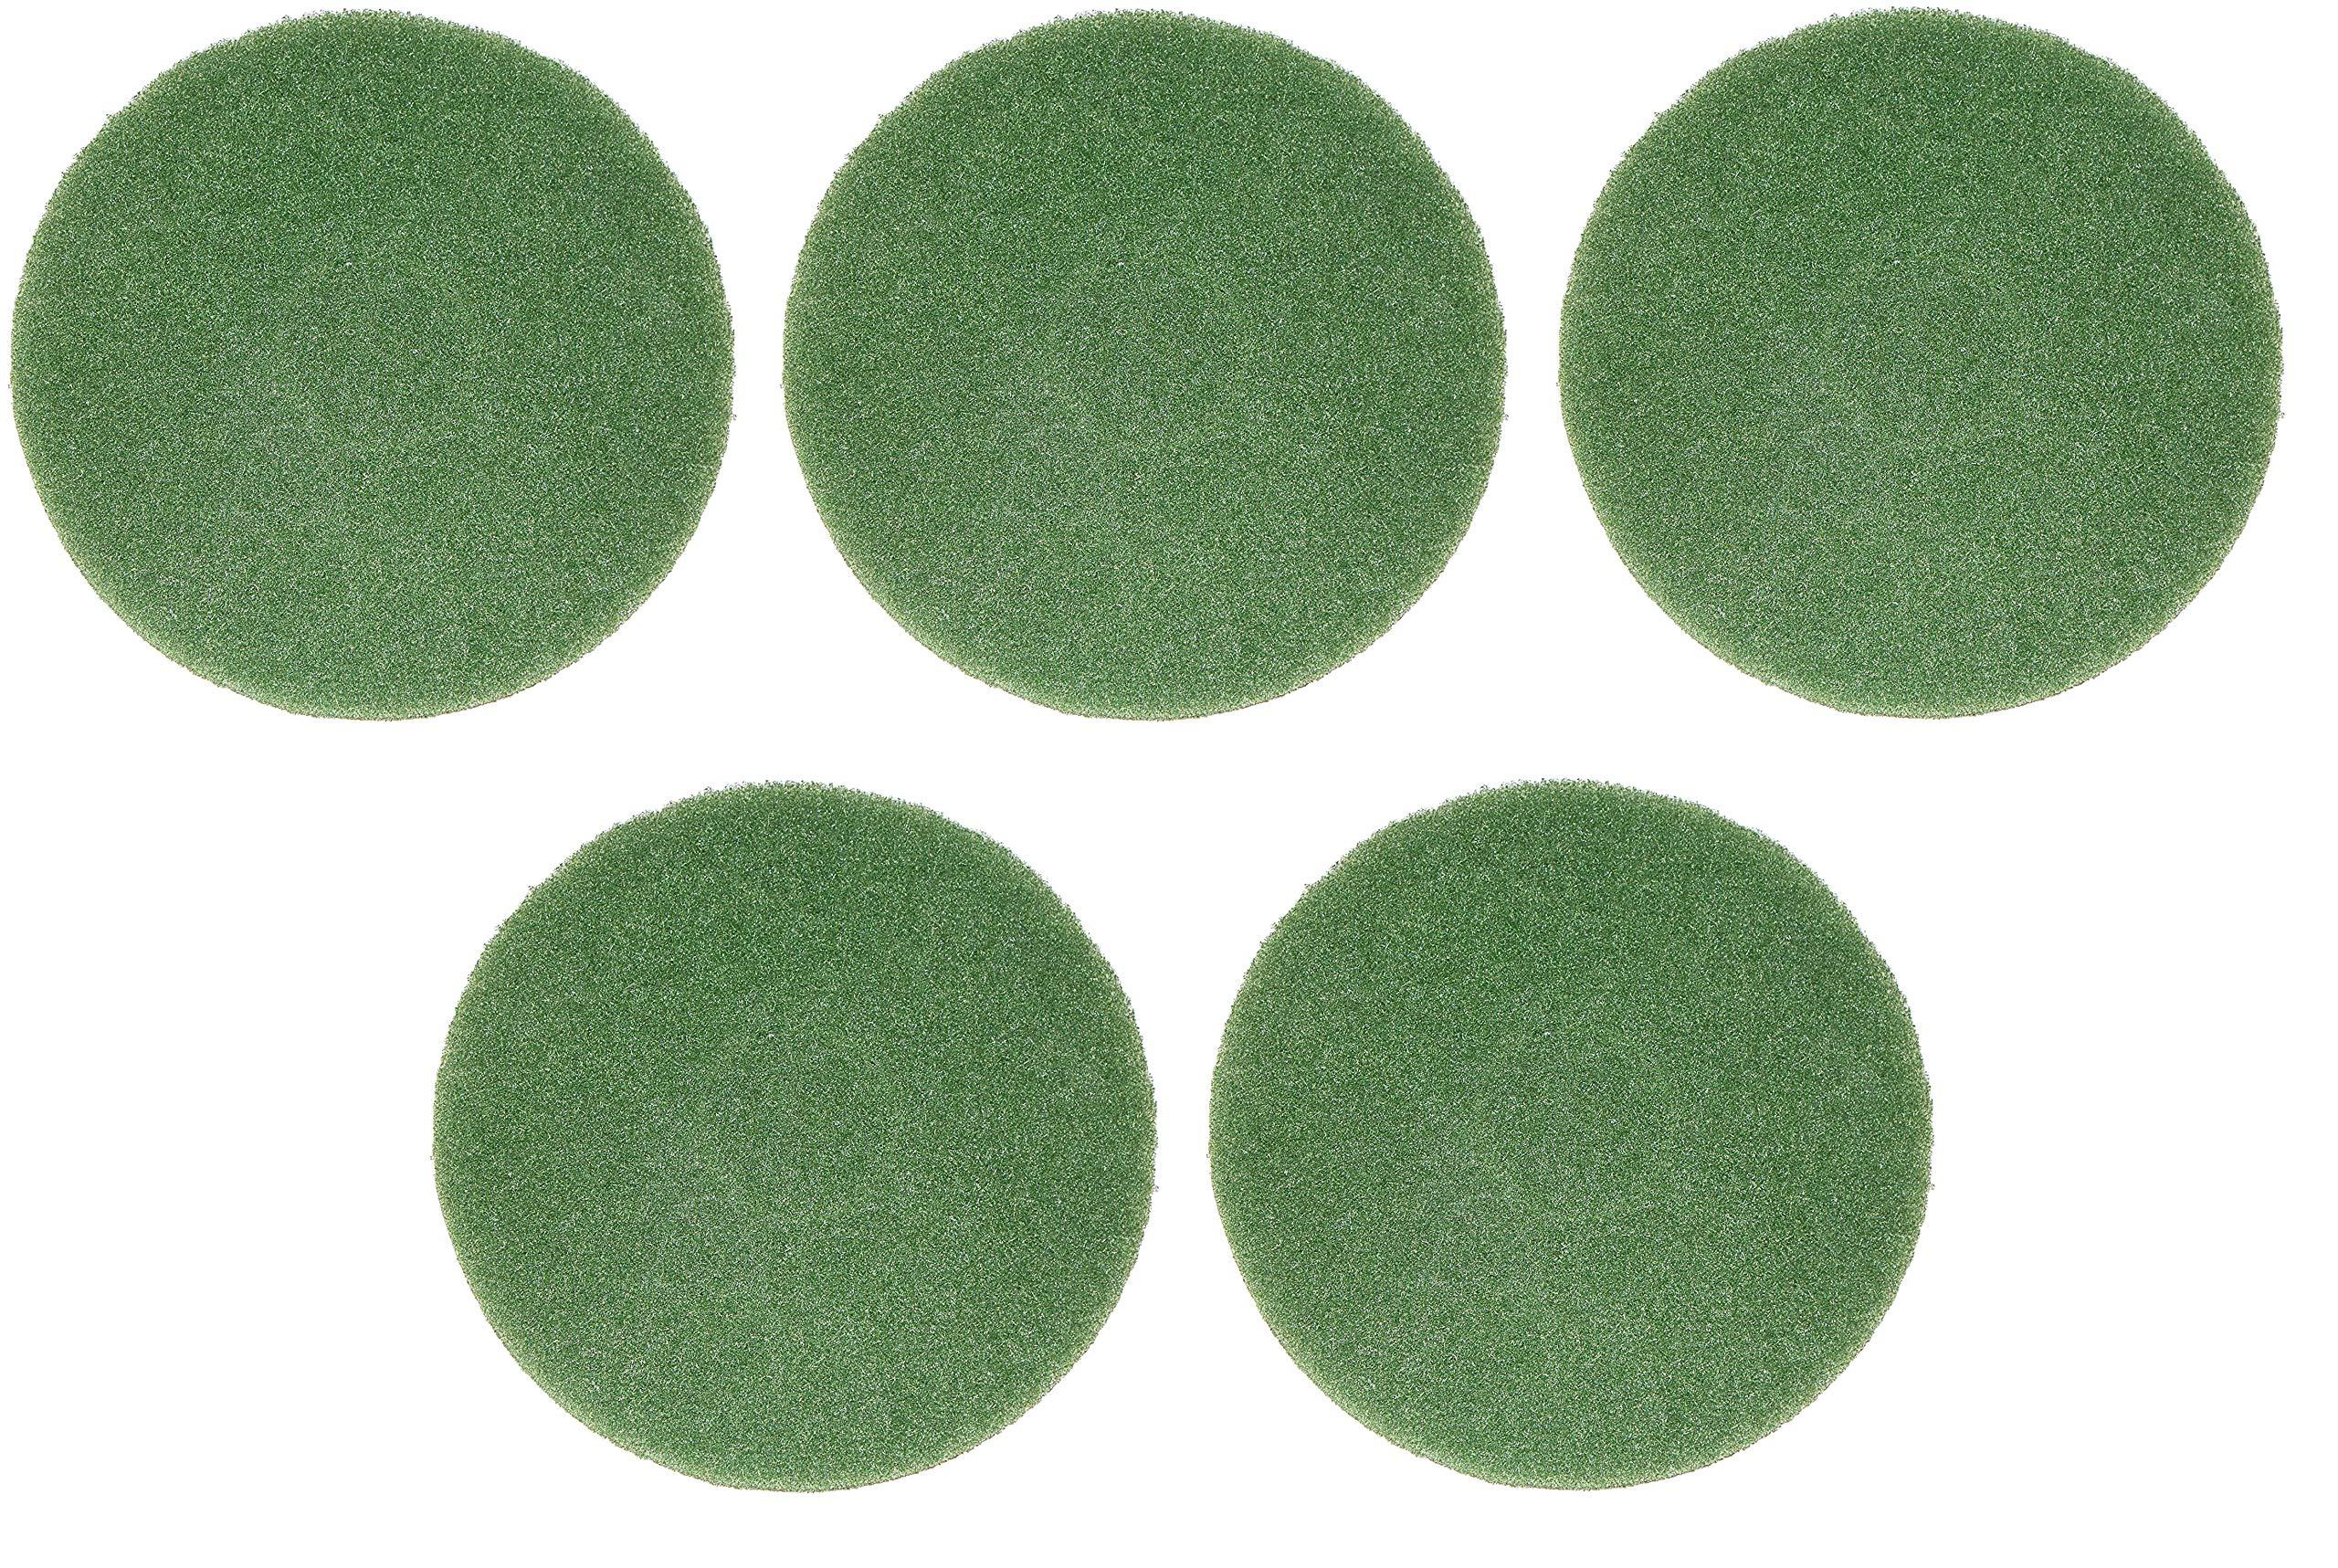 Oreck Commercial 437.056 Cleaning Orbiter Pad, 12'' Diameter, For 550MC Orbiter Floor Machine, Green (5-Pack)